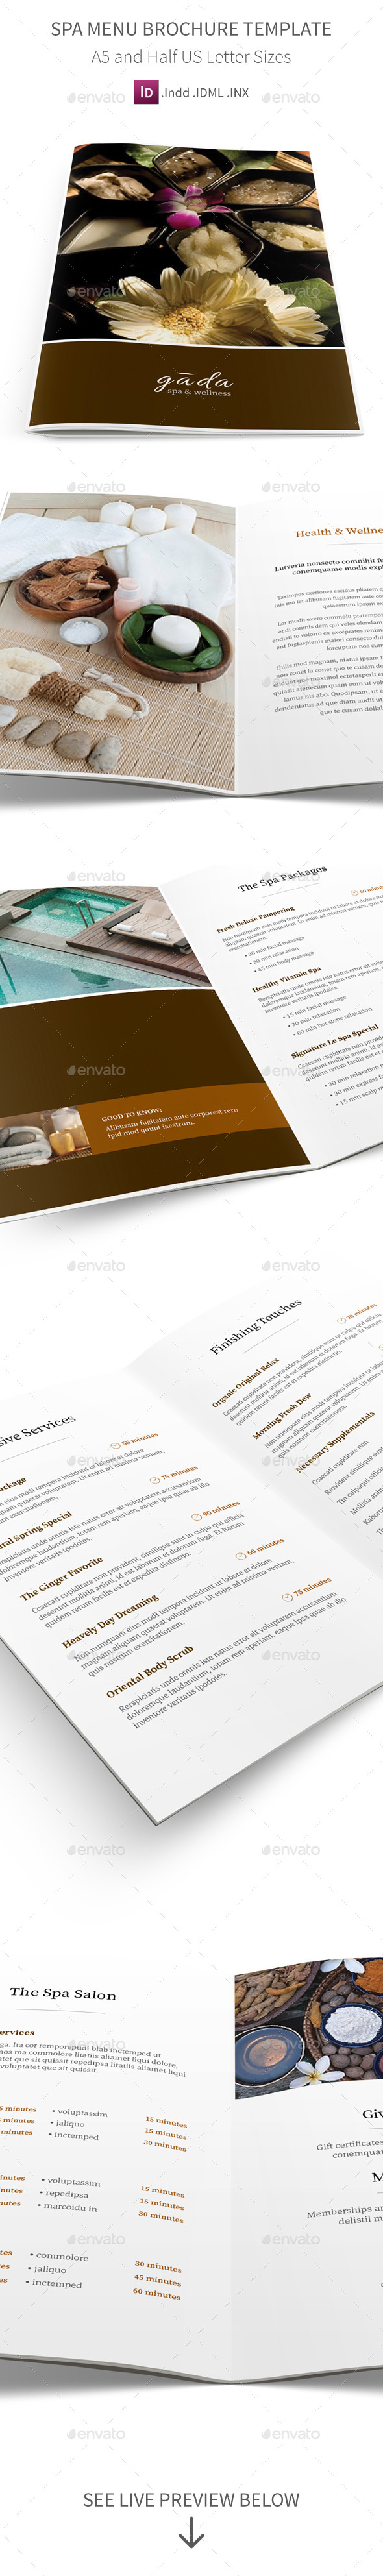 Spa Menu Brochure A5 / Half Letter Sizes - Informational Brochures